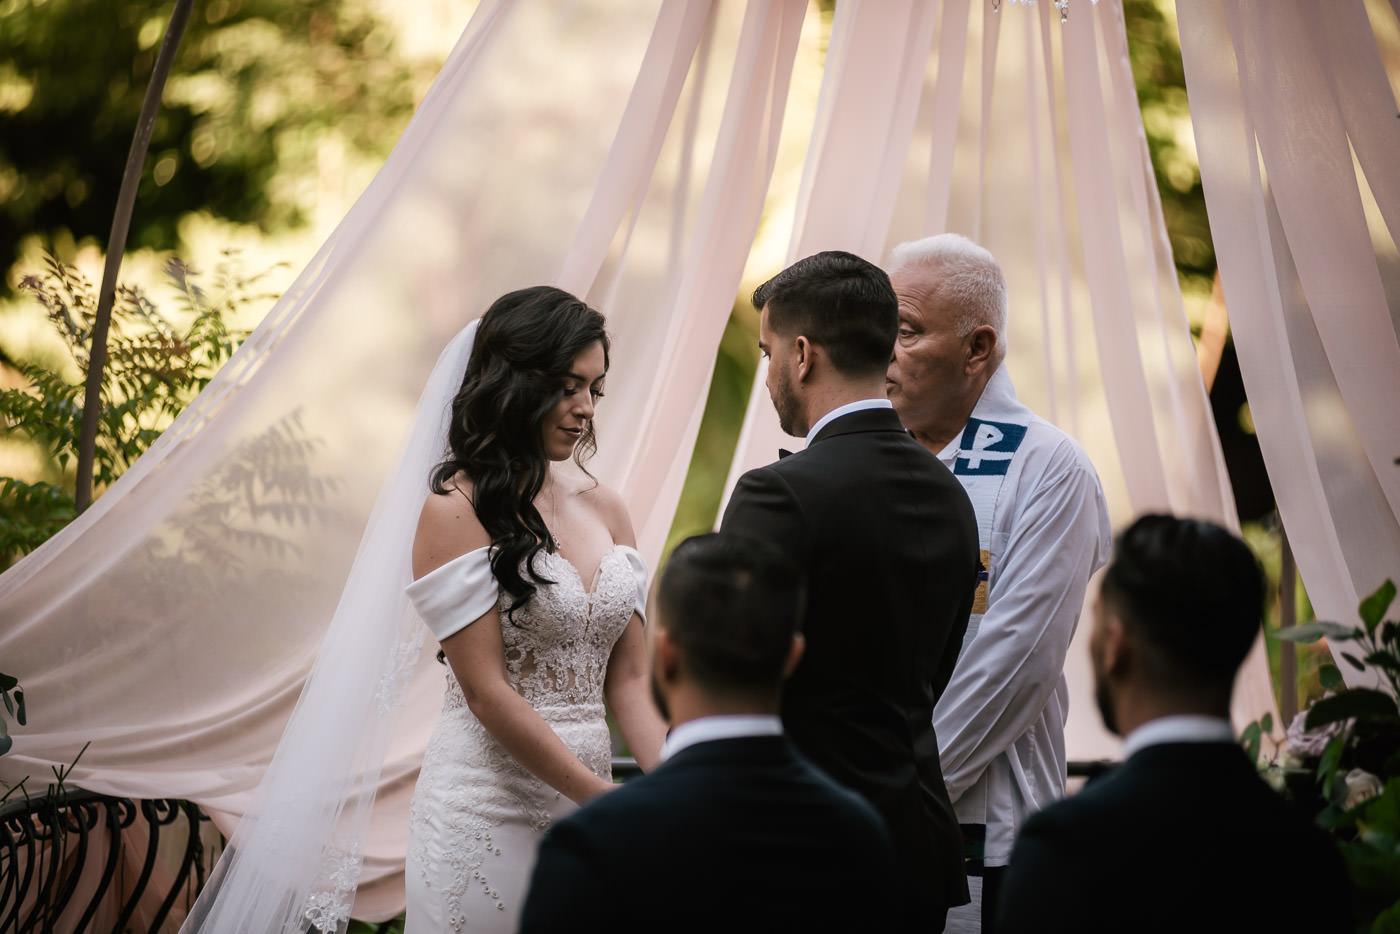 eden-gardens-wedding-photographer-romantic-43.jpg